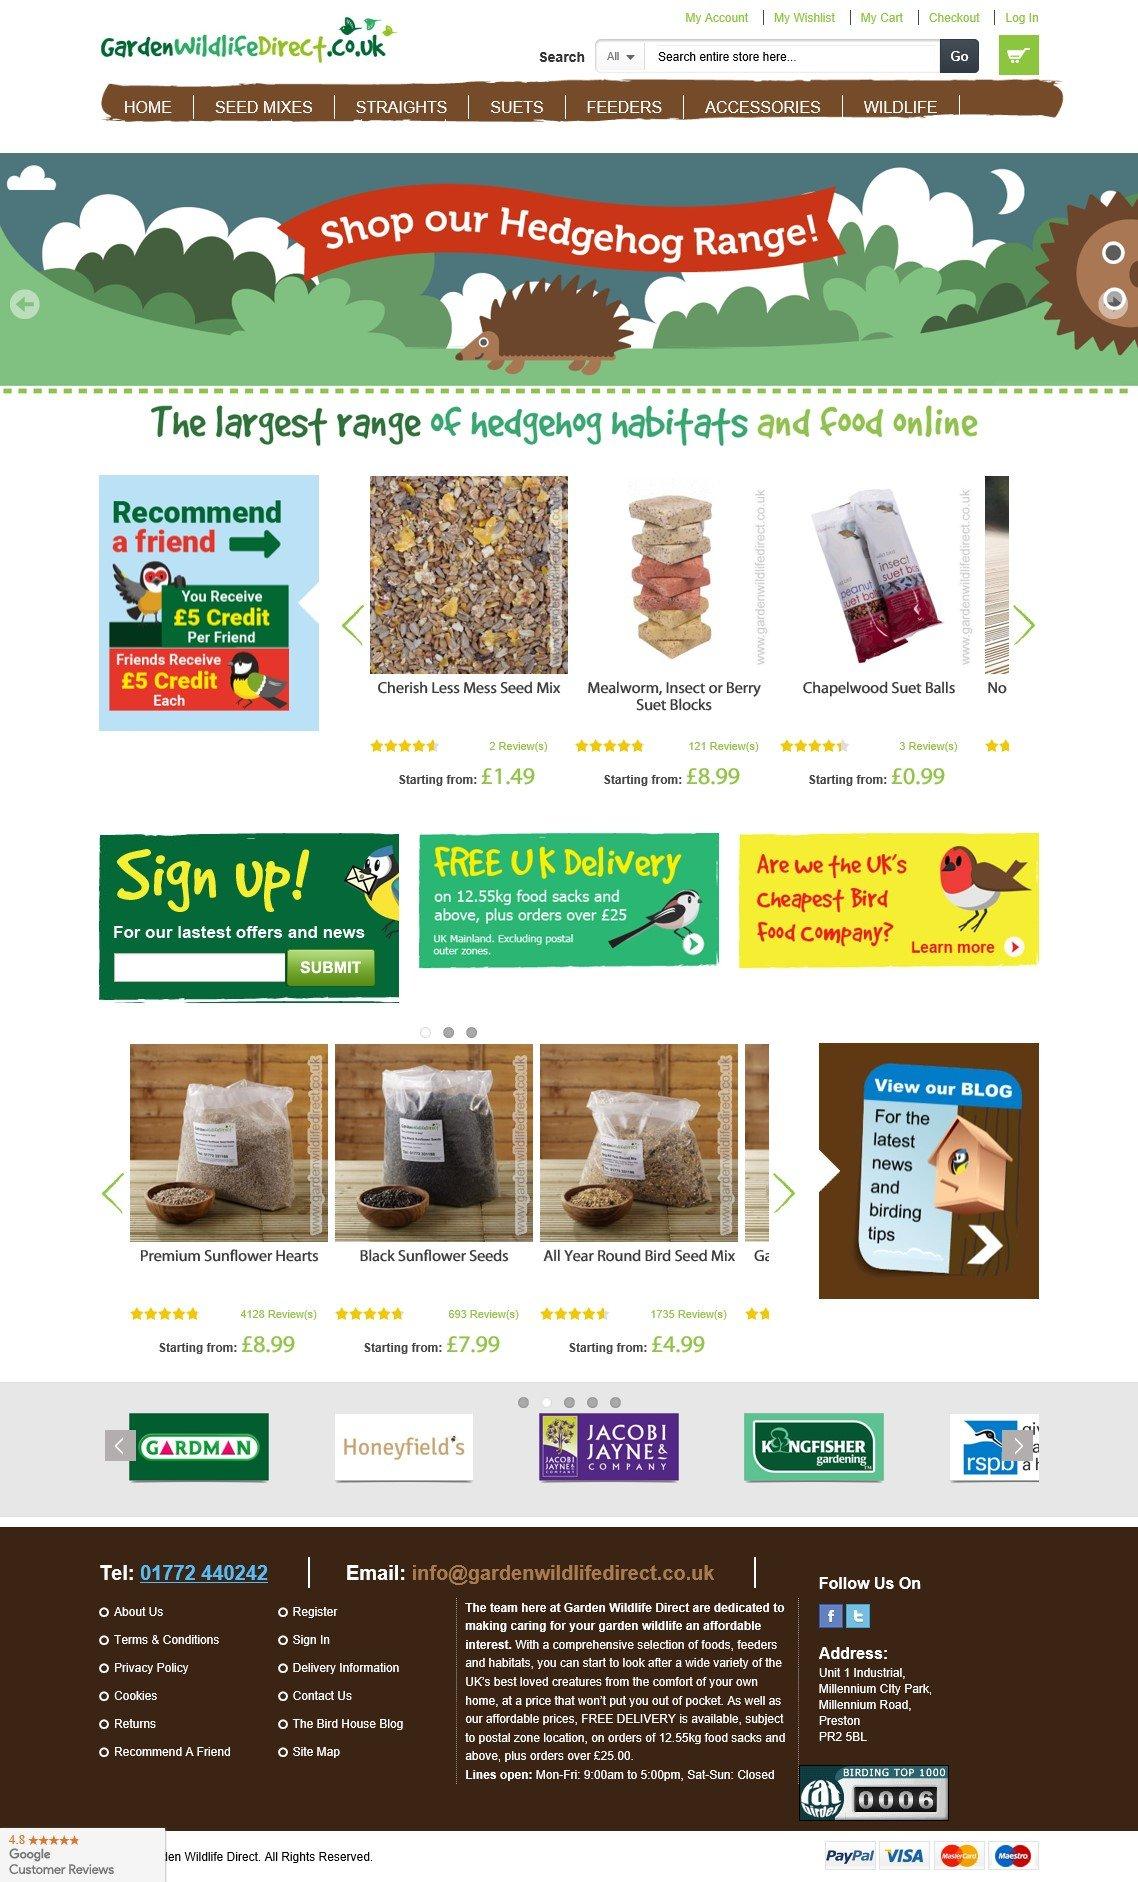 Garden Wildlife Direct - The UK's cheapest wild bird food delivered direct to your door